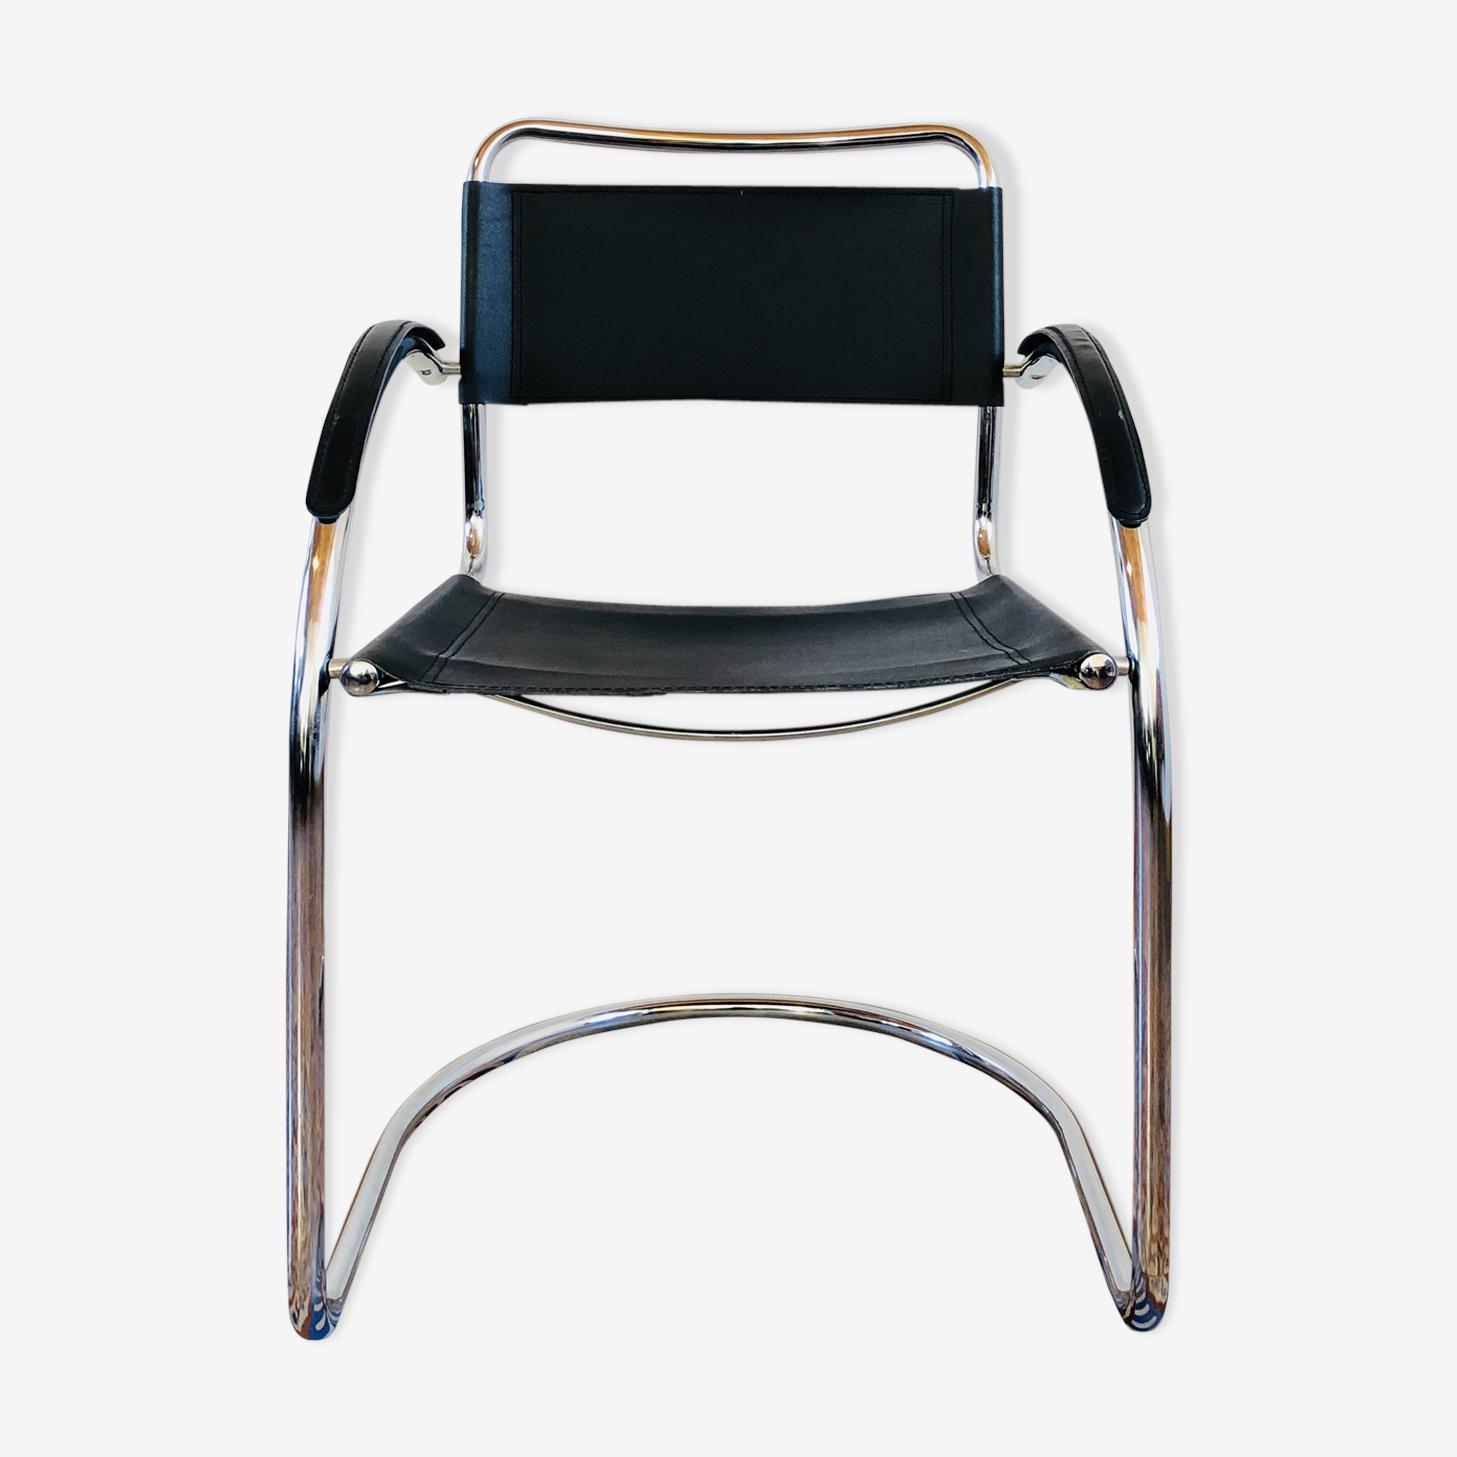 Italian leather and chrome chair